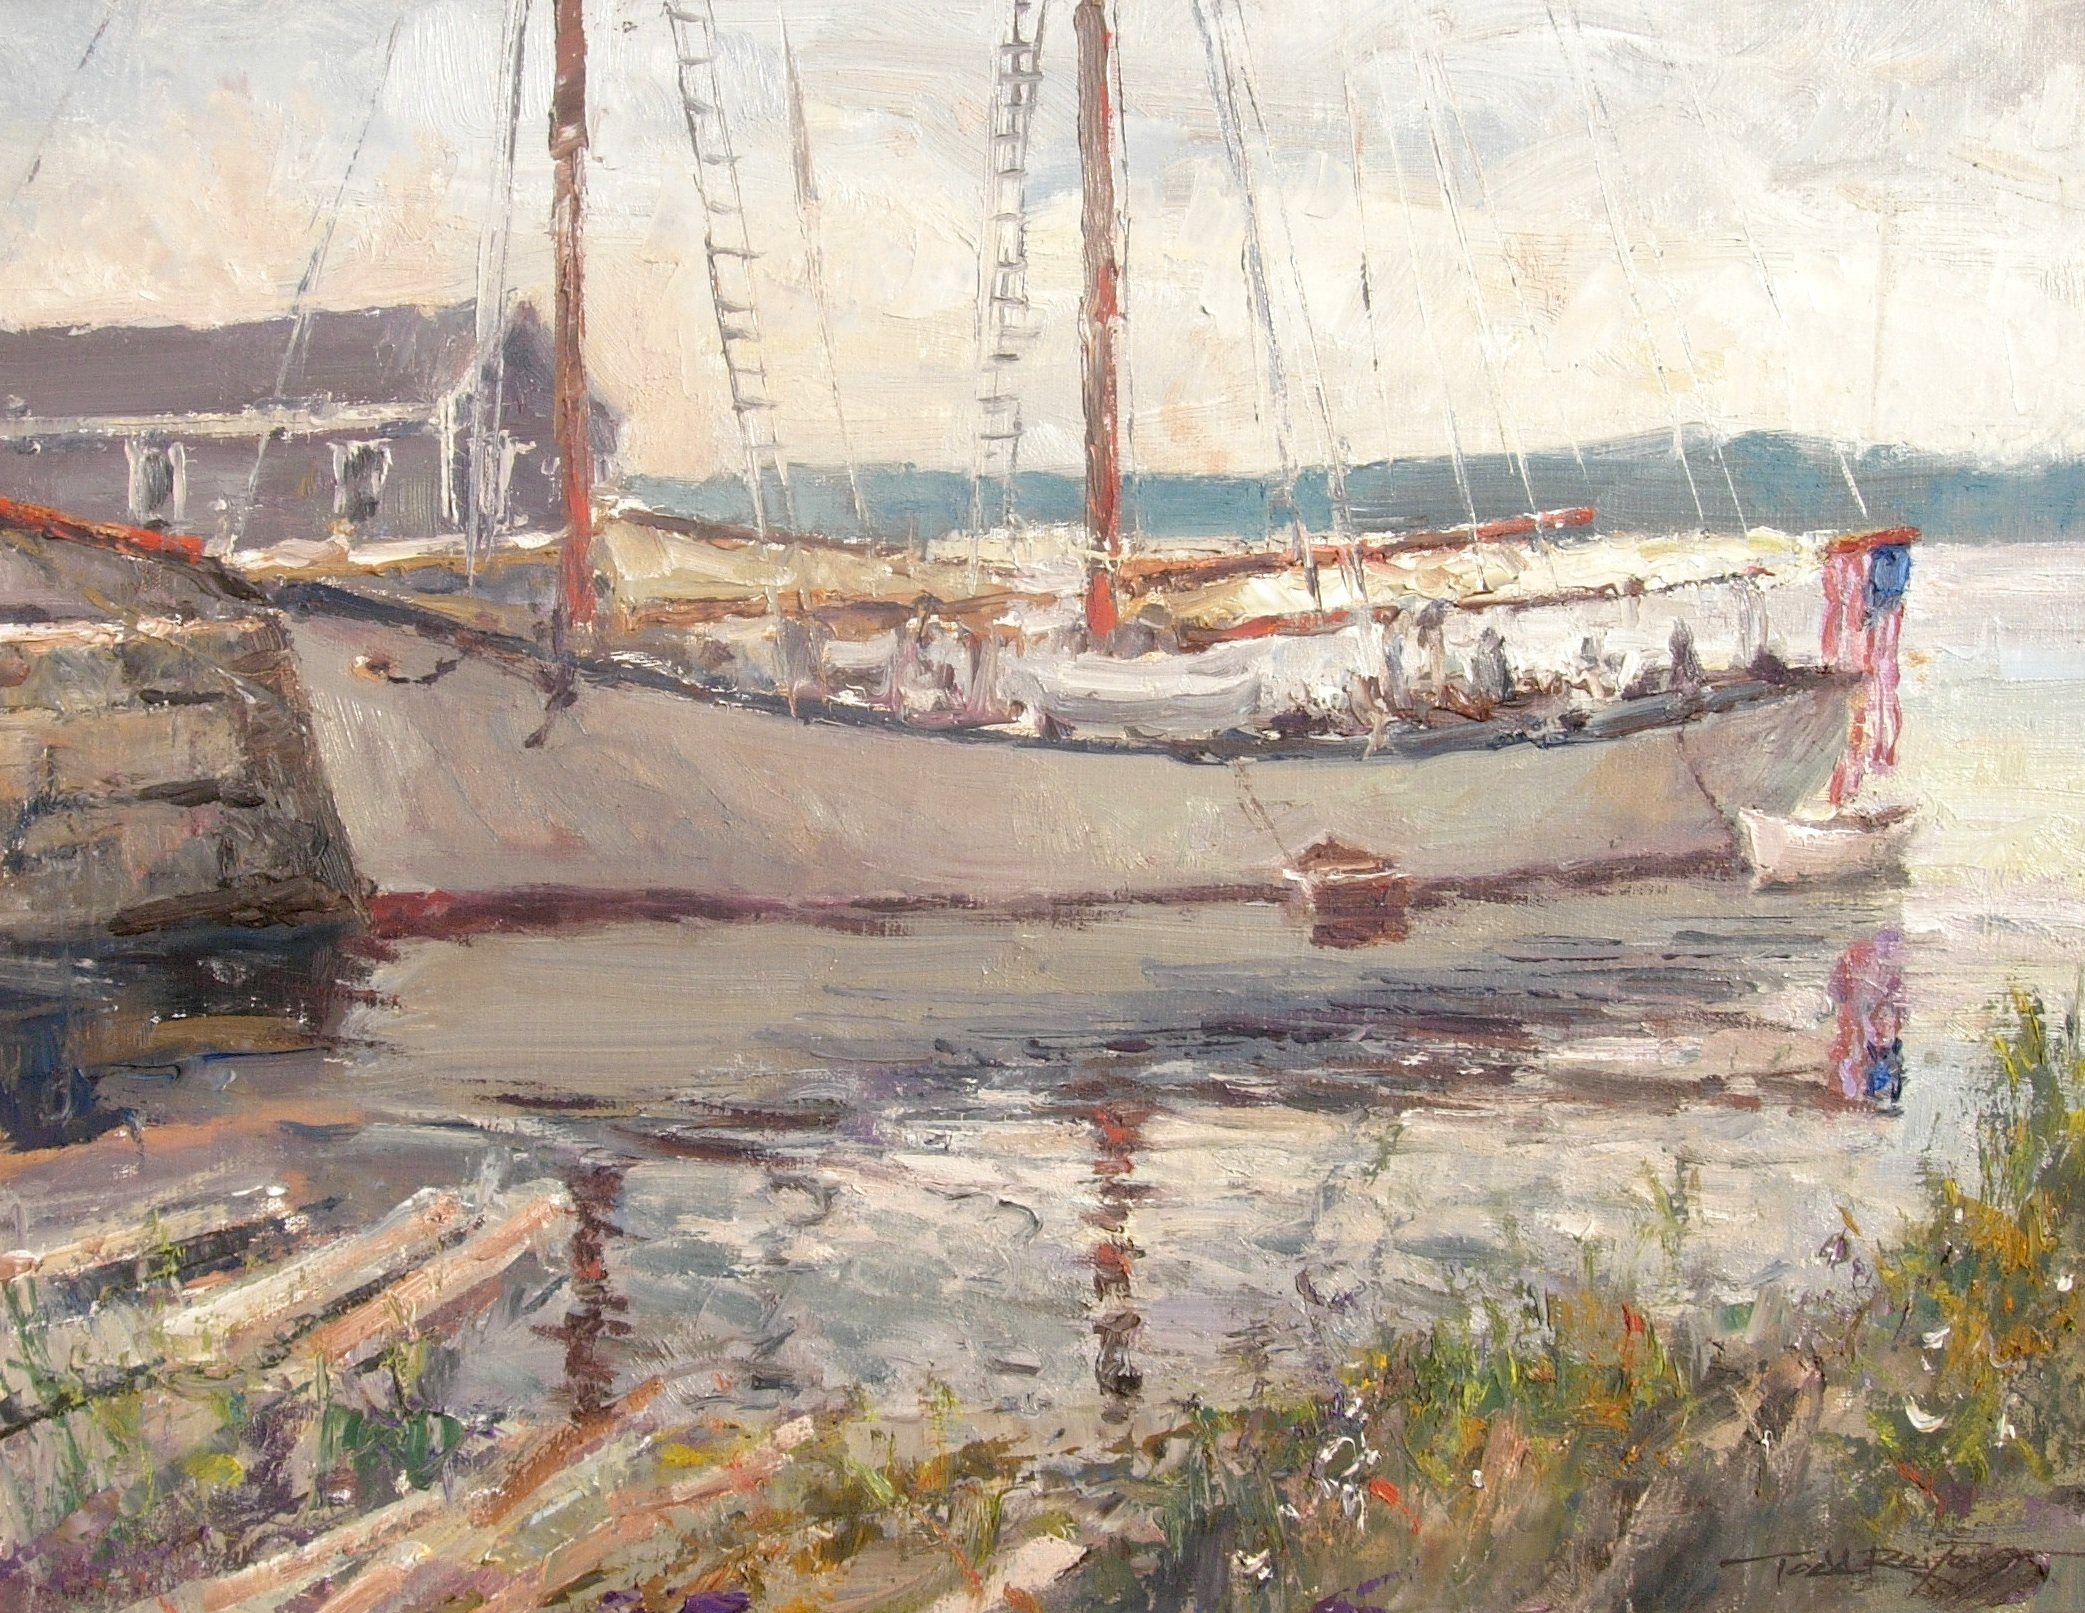 reifers-schoonerrockland-cropped